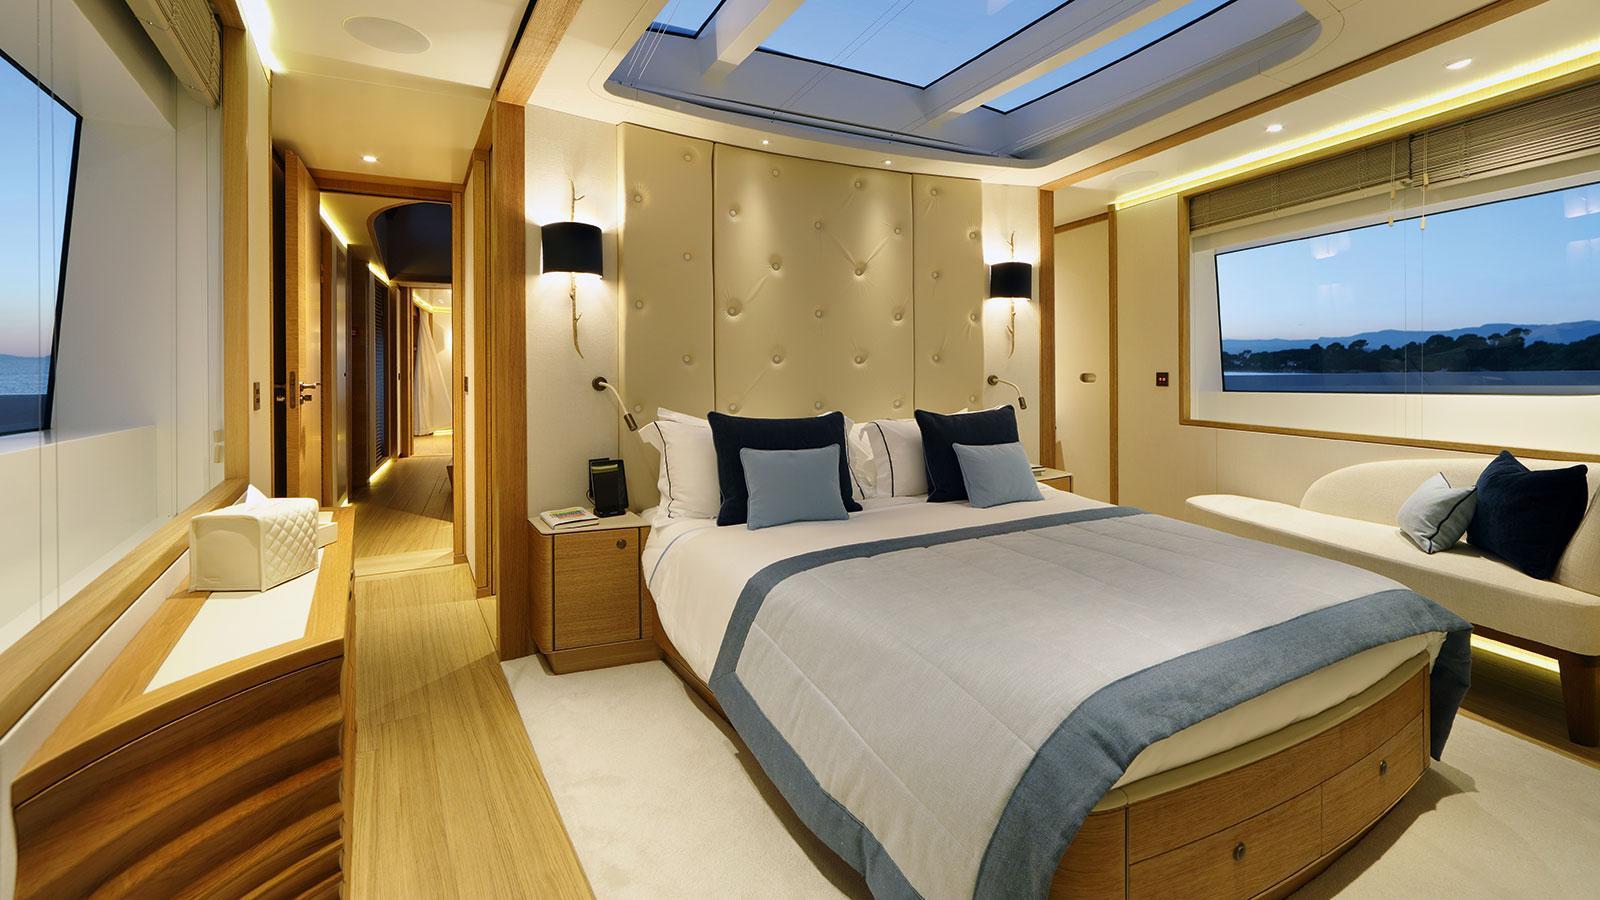 solis-motor-yacht-mulder-2015-34m-stateroom